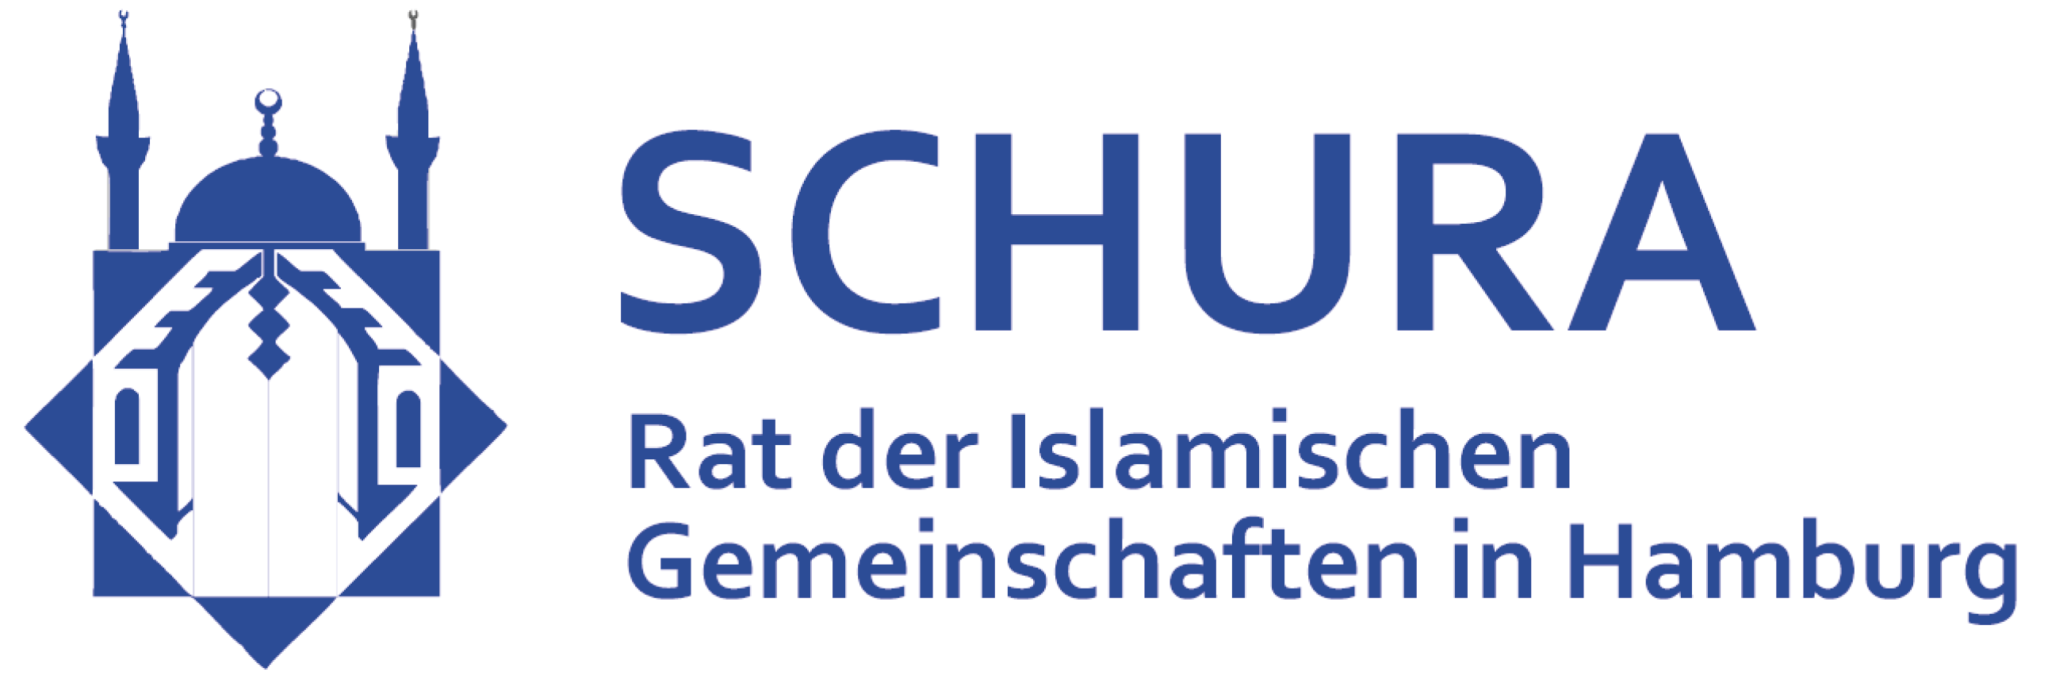 Schura Hamburg